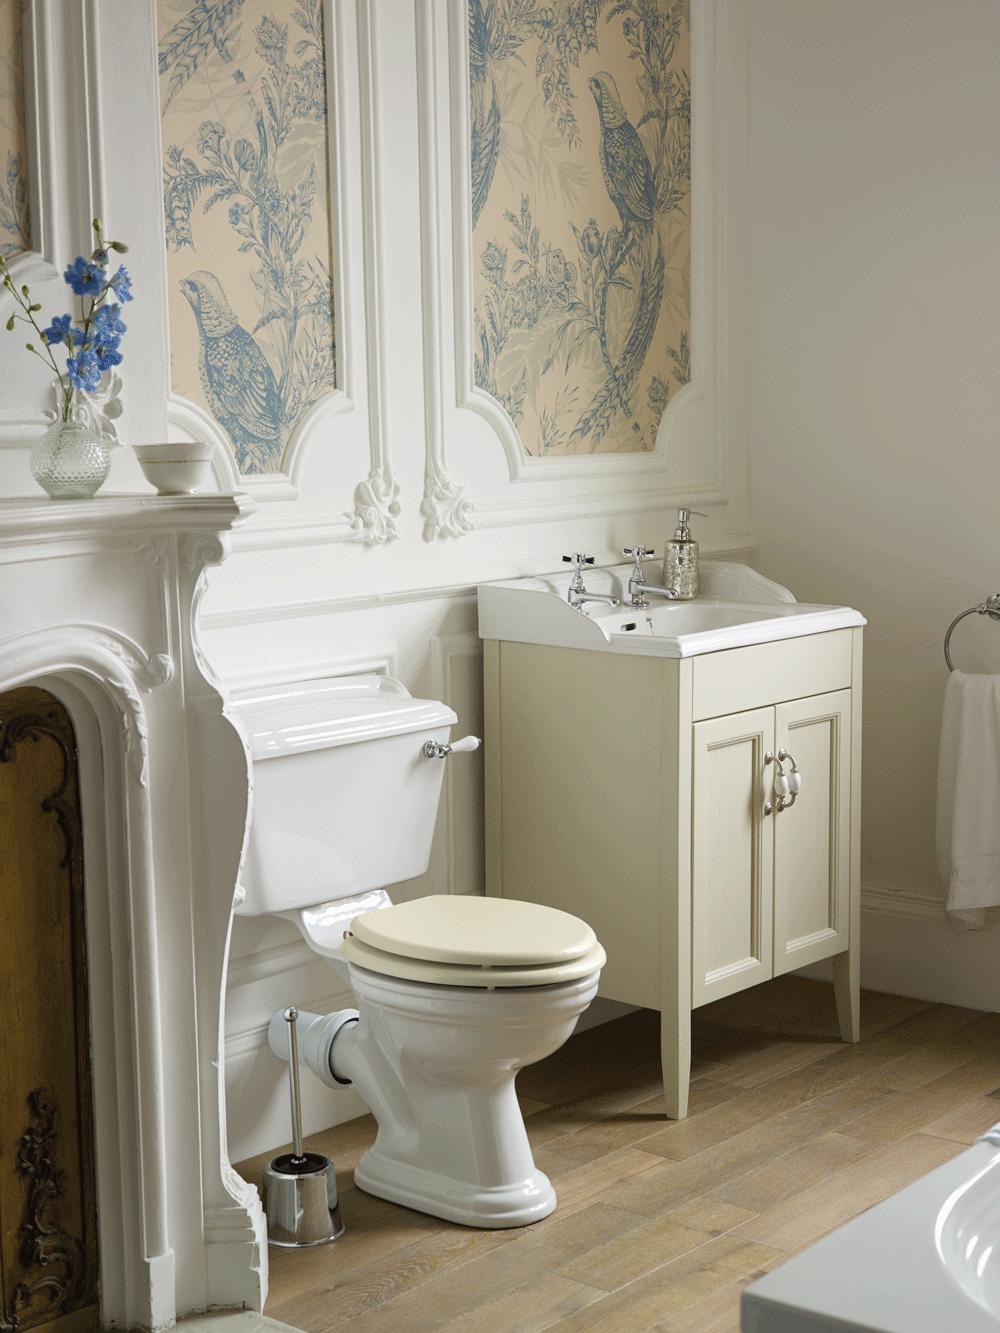 Heritage bathroom furniture - Heritage Bathroom Furniture Dorchester Vanity In Oyster From Tubs Tiles